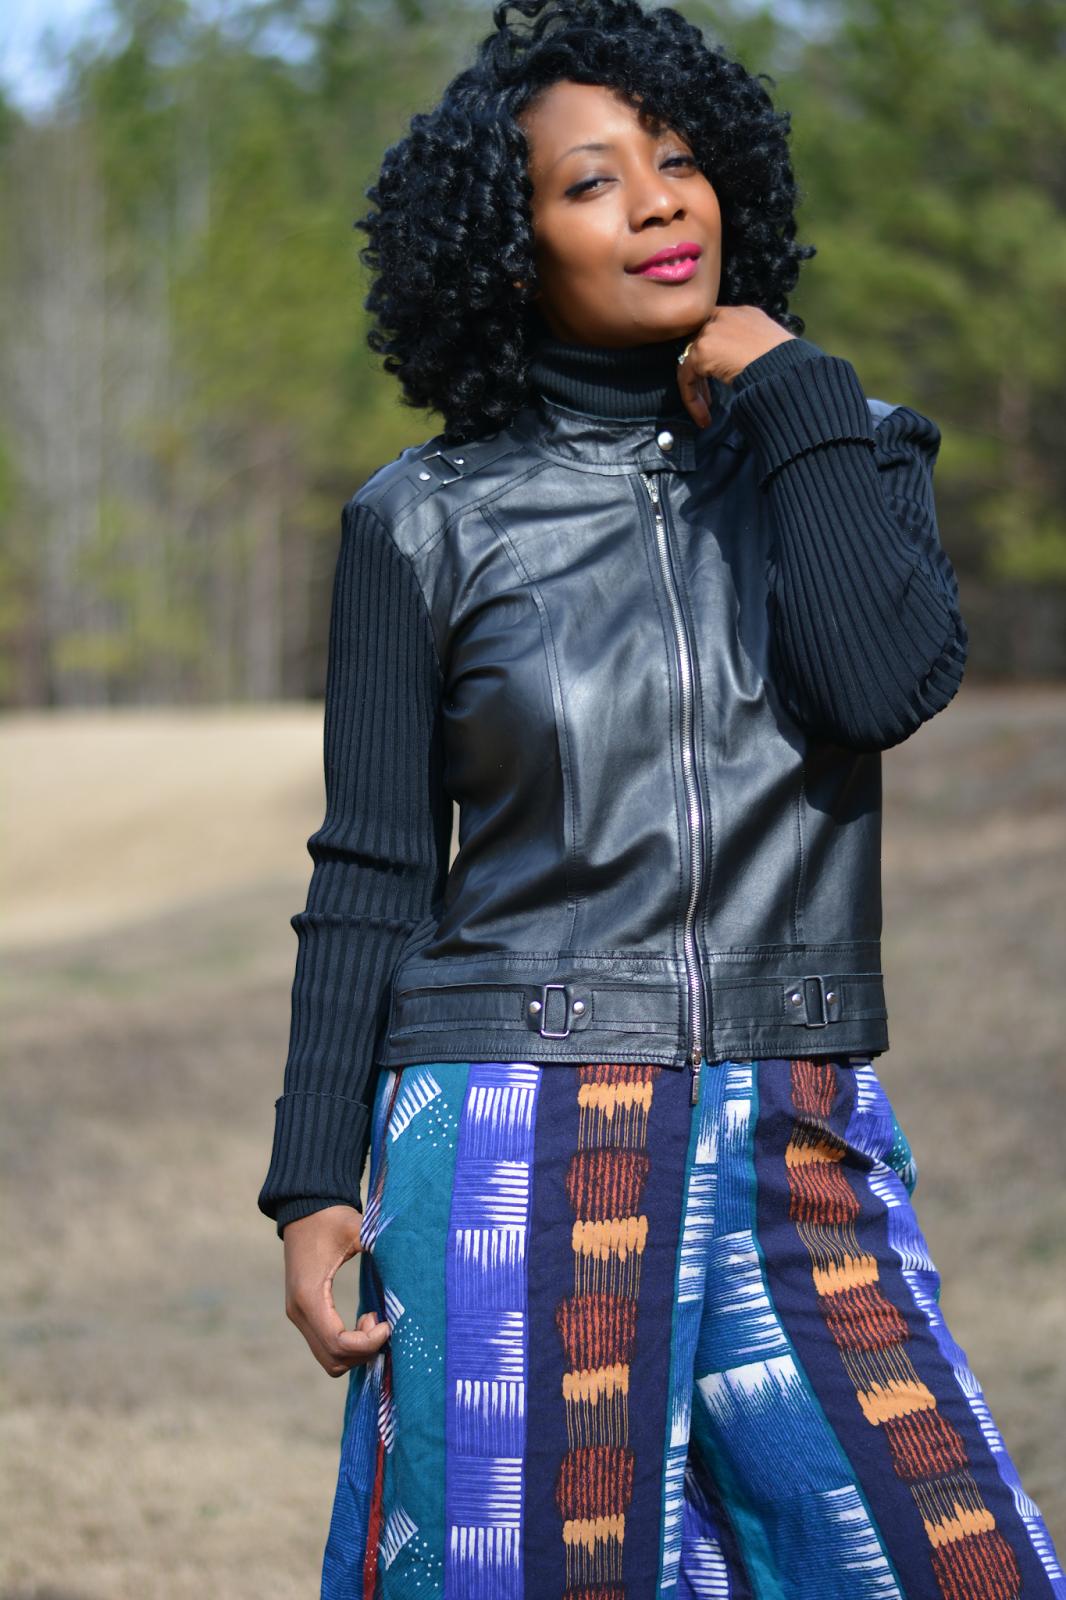 thrift style fashion